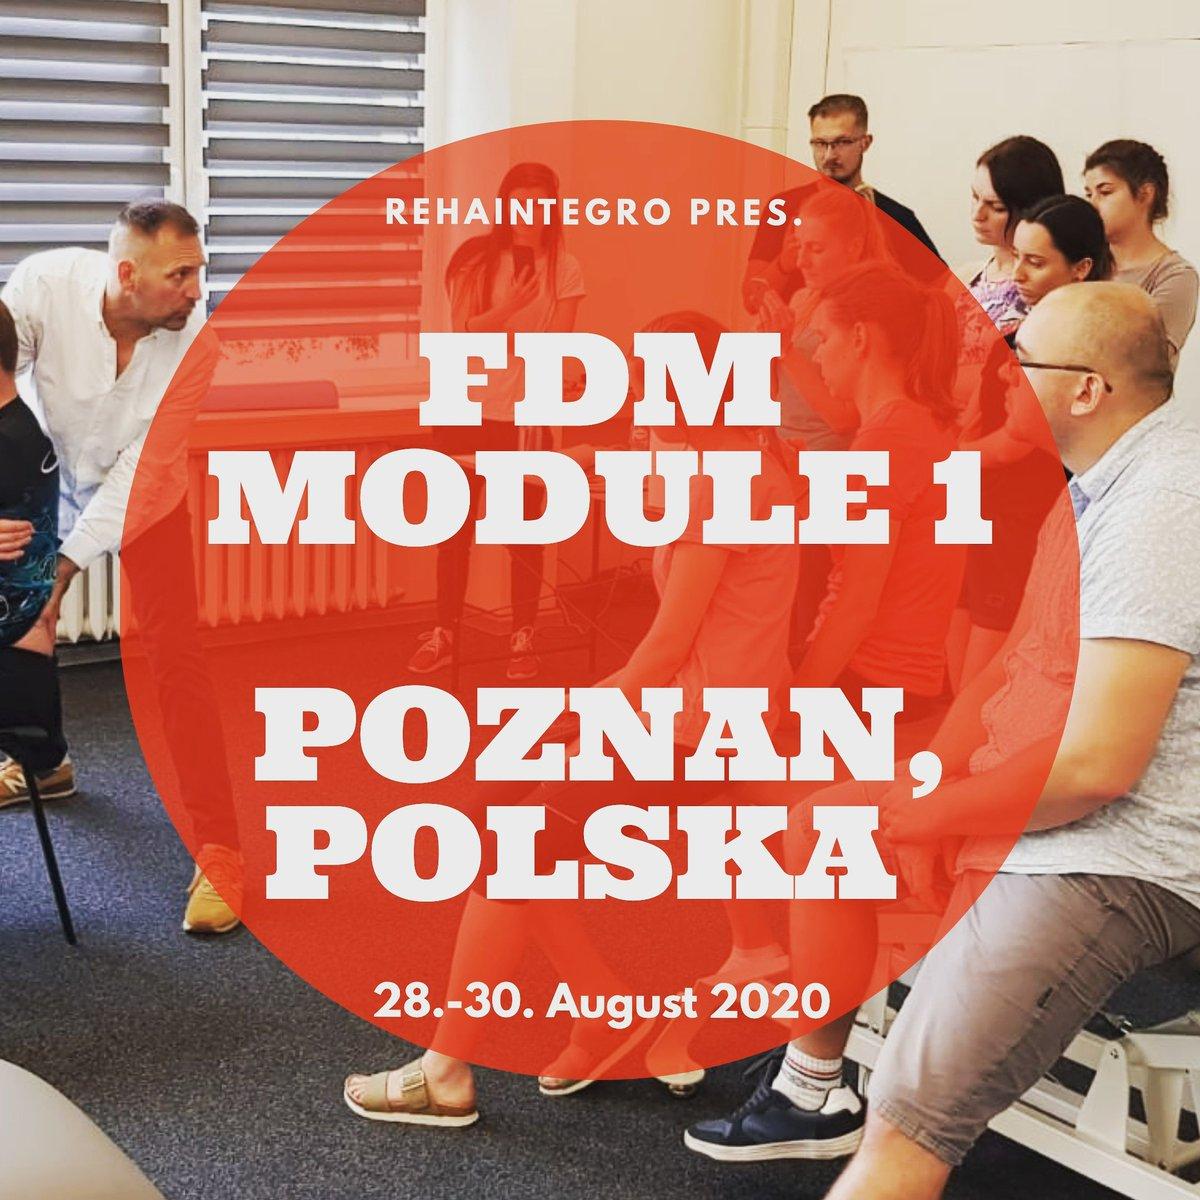 FASCIAL DISTORTION MODEL MODULE 1 in Poznan, POLSKA  at REHAINTEGRO 28.-30.8.2020 #fascialdistortionmodel #fizjoterapia #fizjopic.twitter.com/m2bBVrPq0p